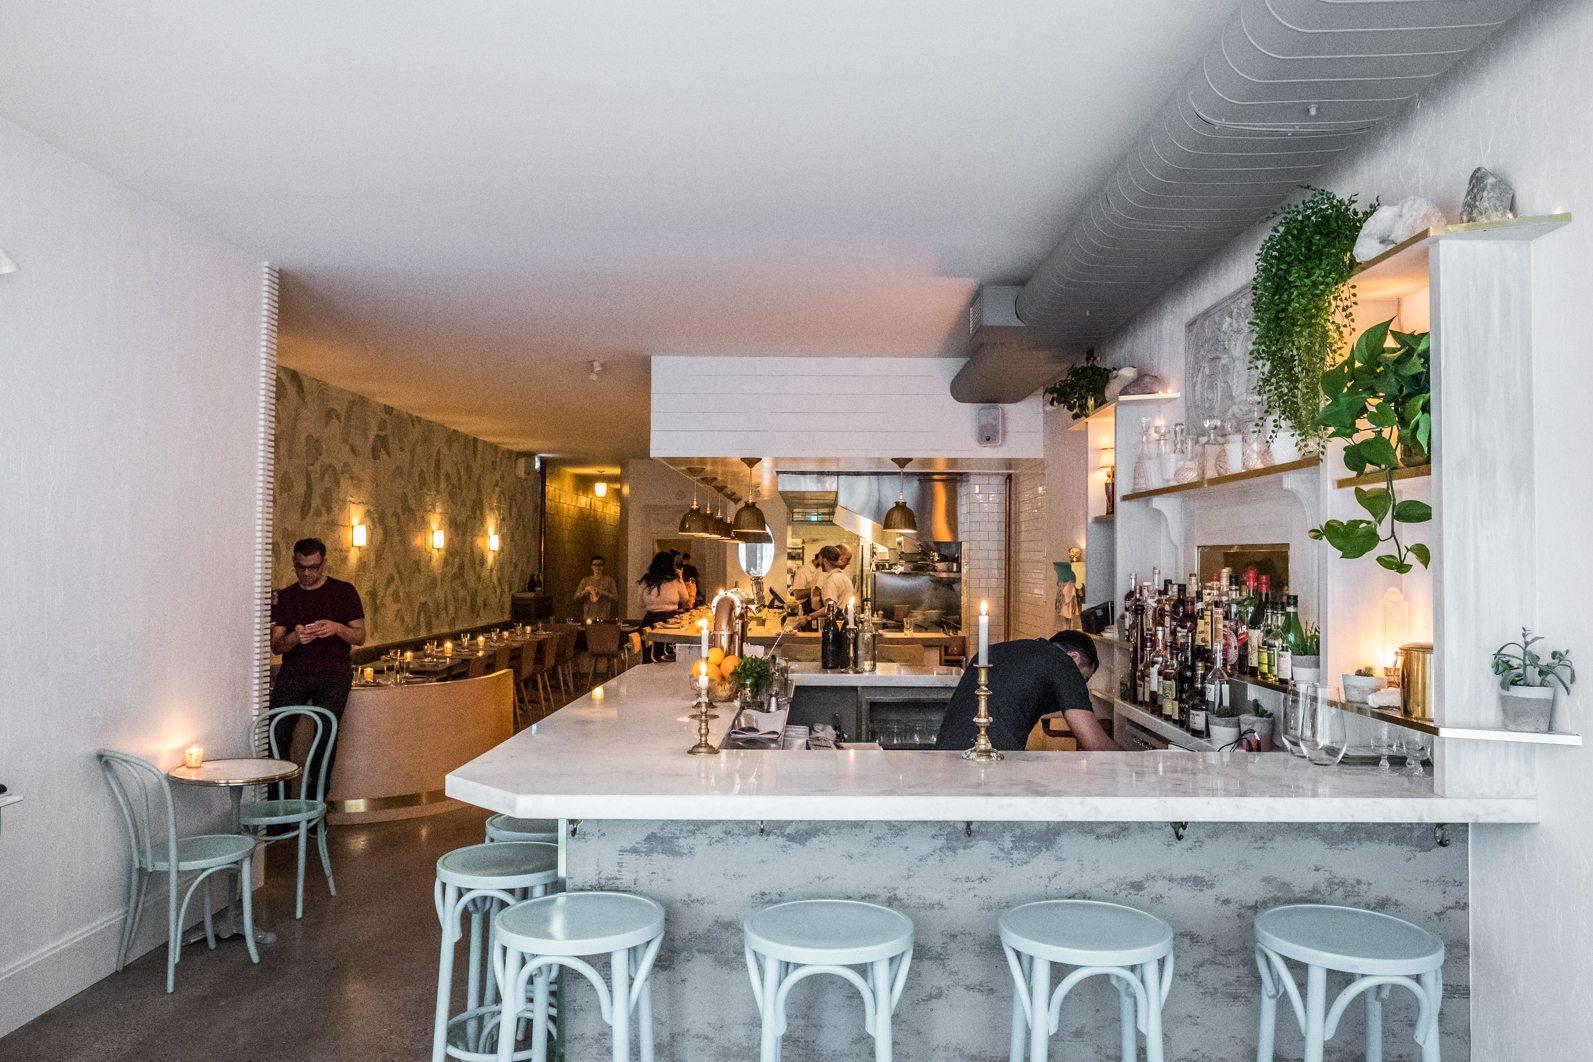 toronto-restaurants-grey-gardens-kensington-market-jen-agg-wine-cider-room